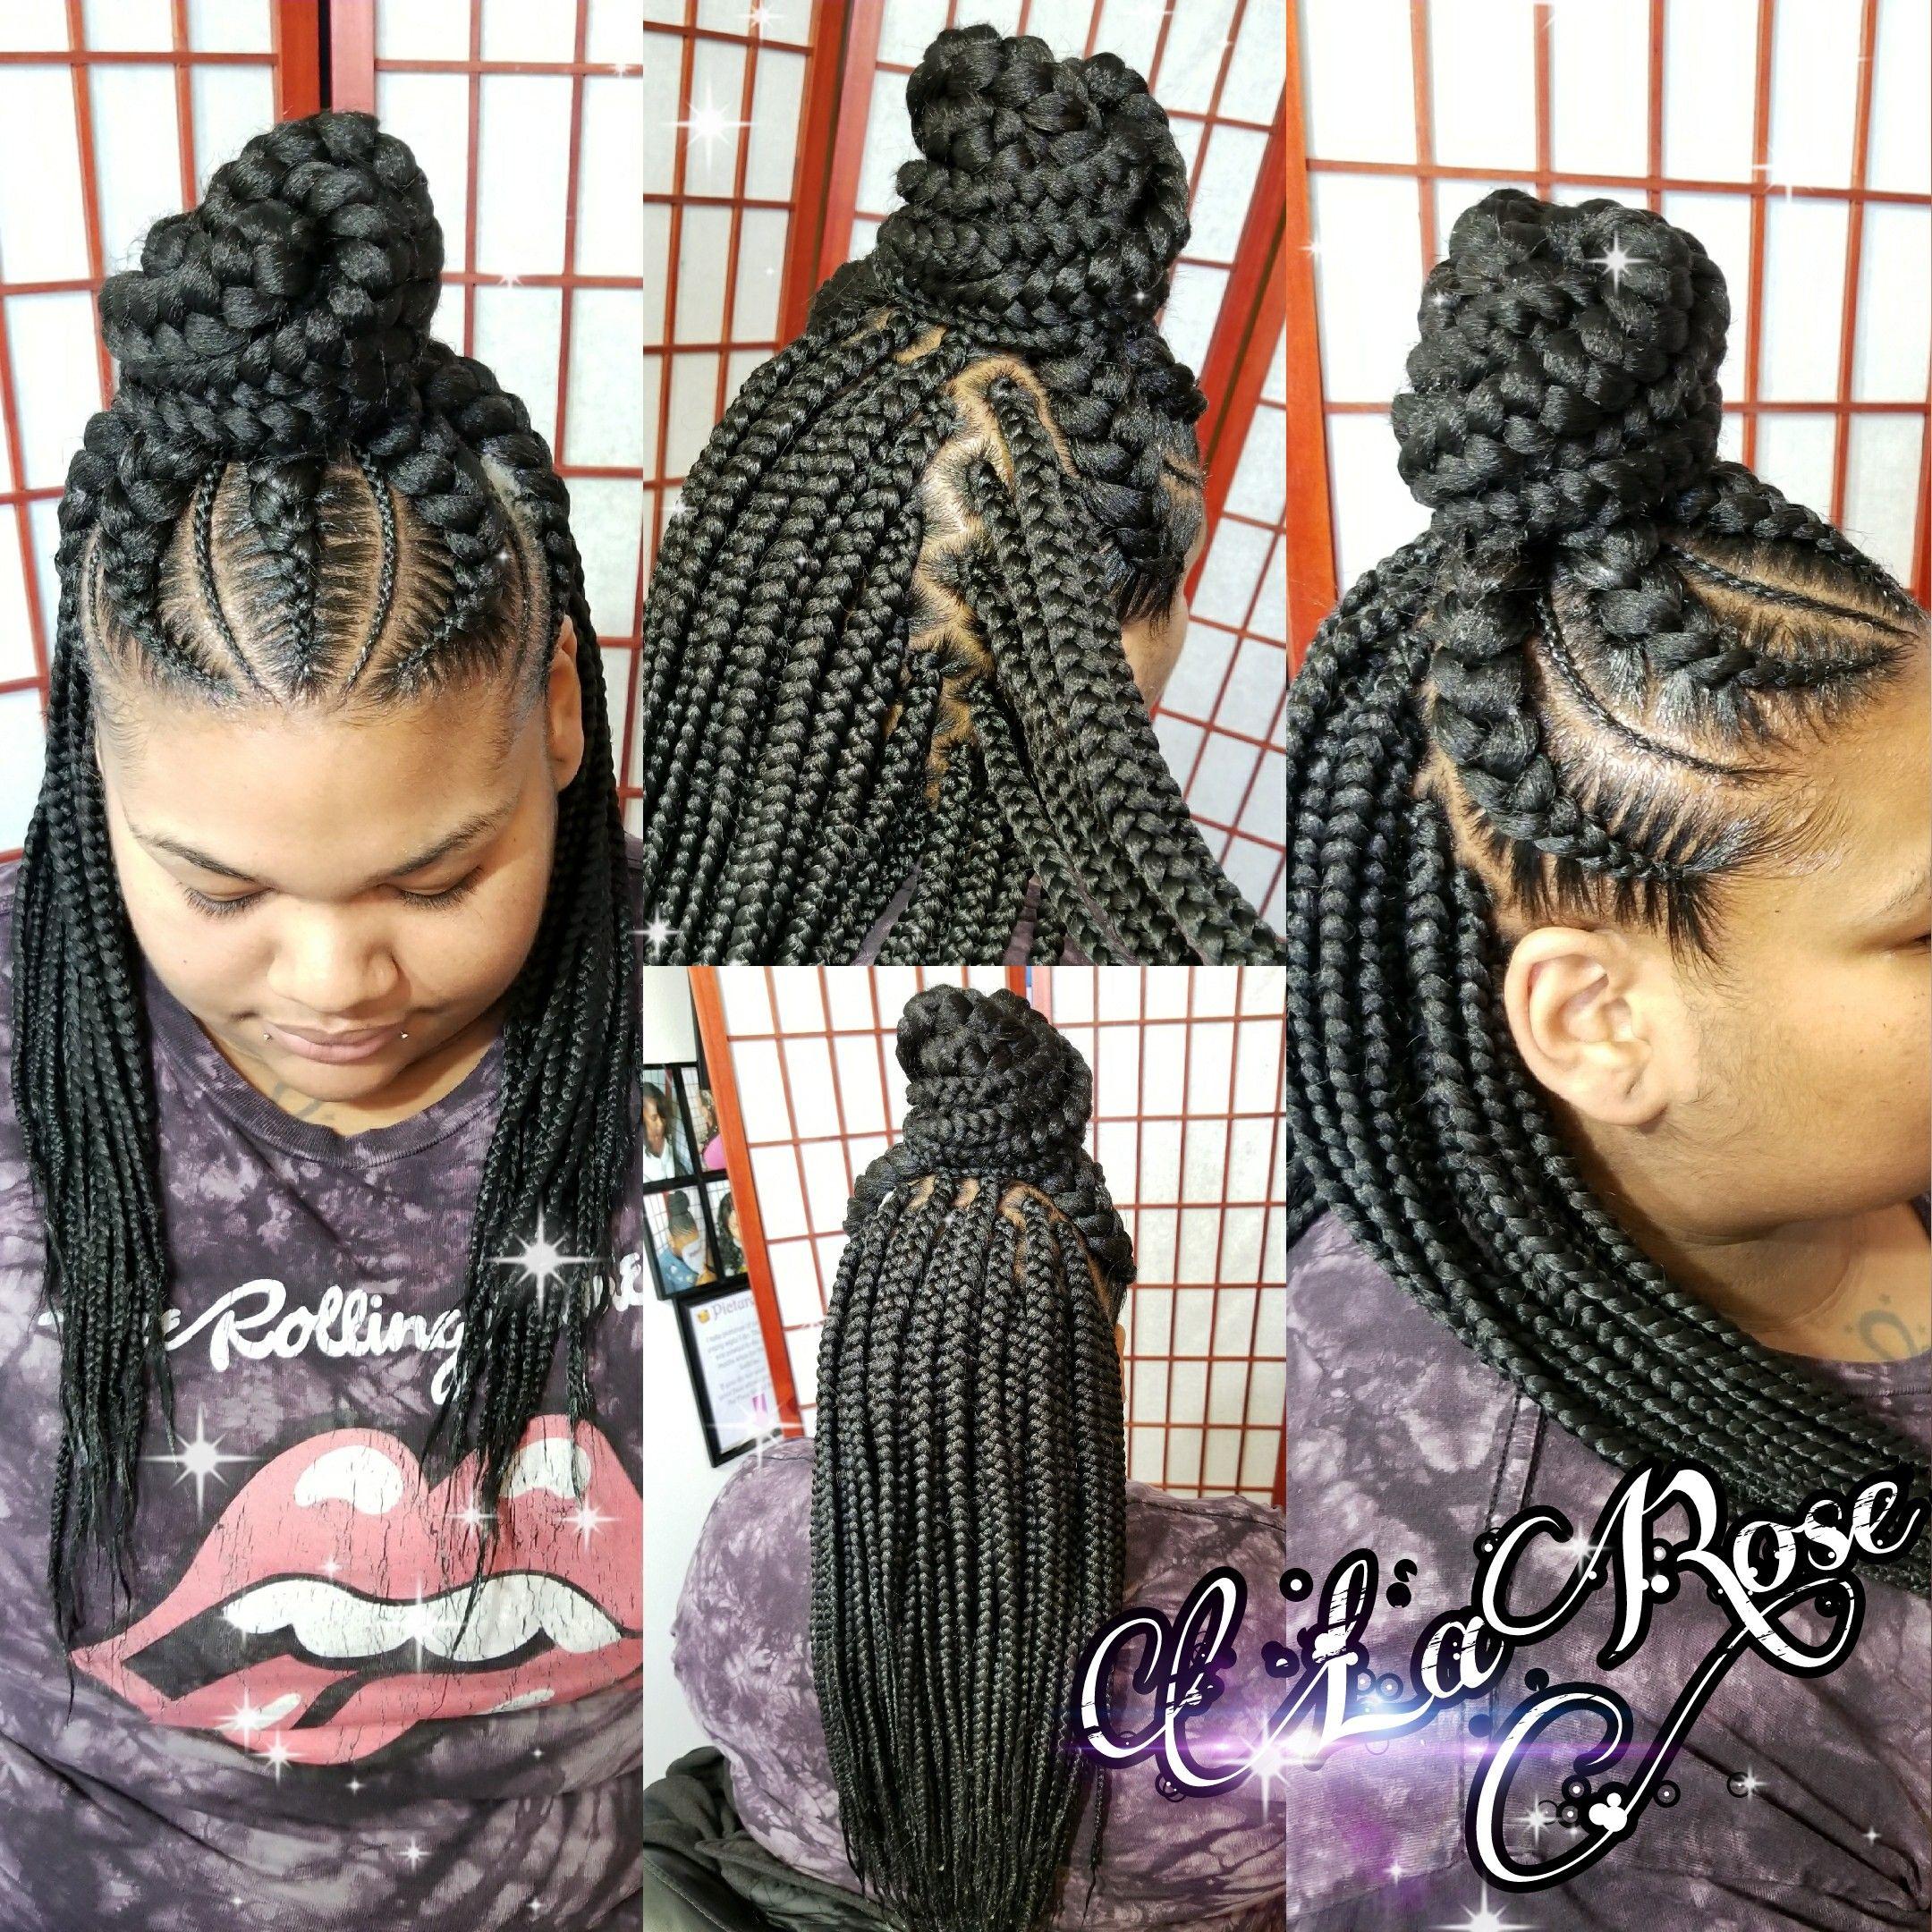 Pin By Randrea Moore On Braids African Braids Hairstyles Braided Hairstyles Blonde Box Braids